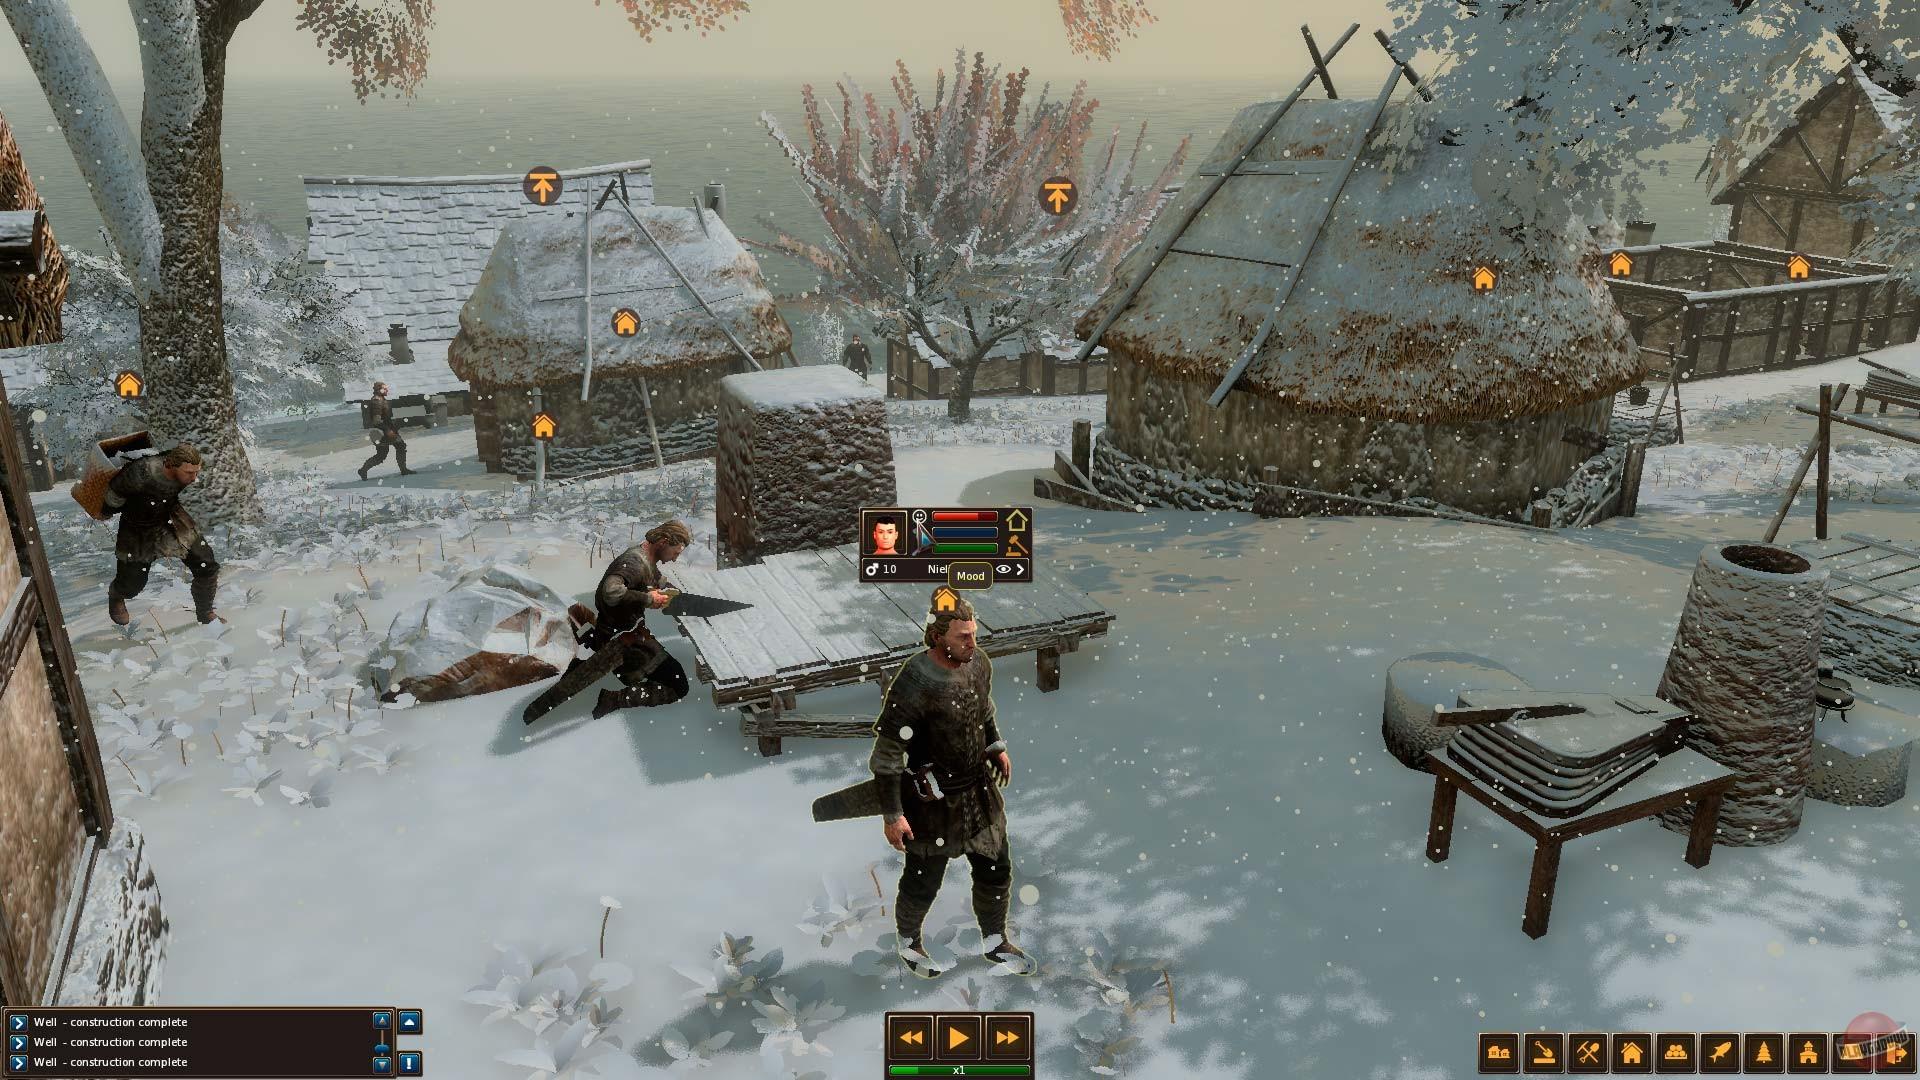 Life is feudal forest village геймплей картинки фото сюжетно-ролевая игра почта